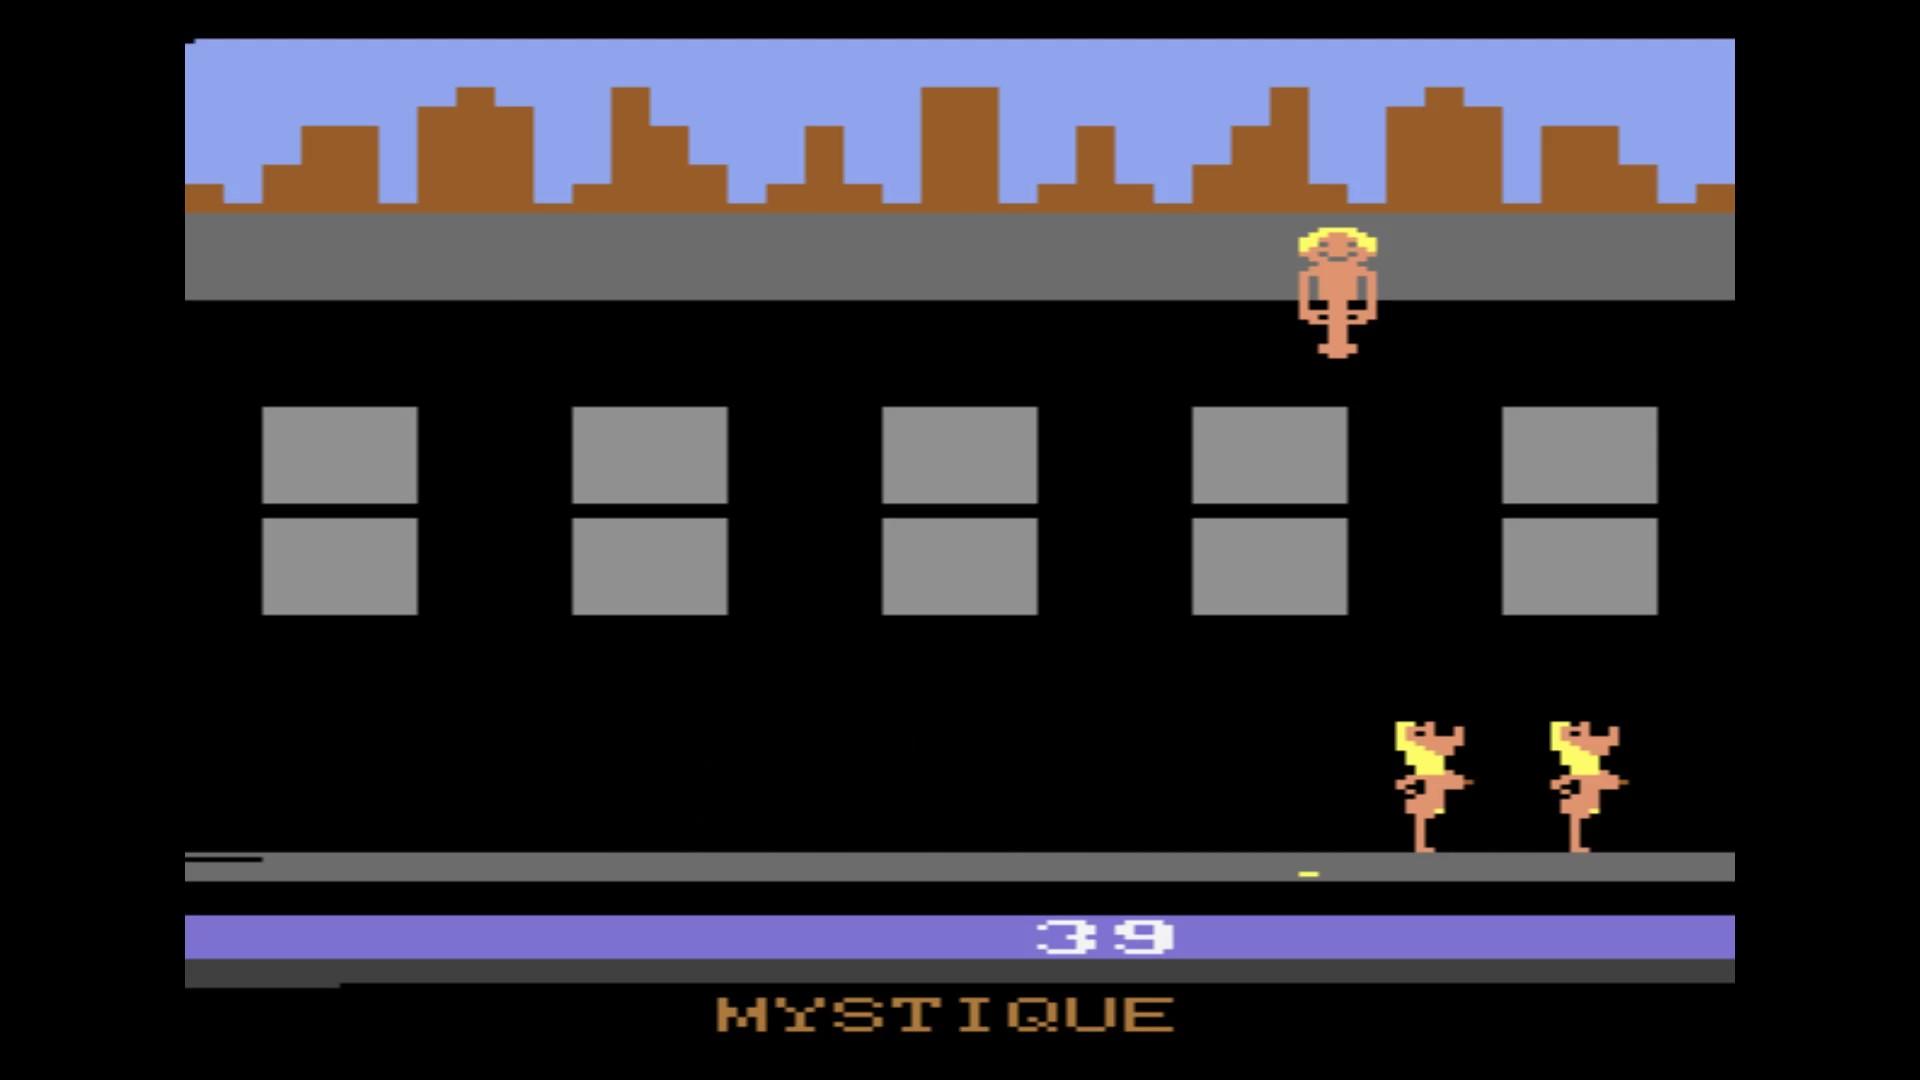 AkinNahtanoj: Beat Em and Eat Em (Atari 2600 Emulated Novice/B Mode) 39 points on 2020-10-13 07:35:38